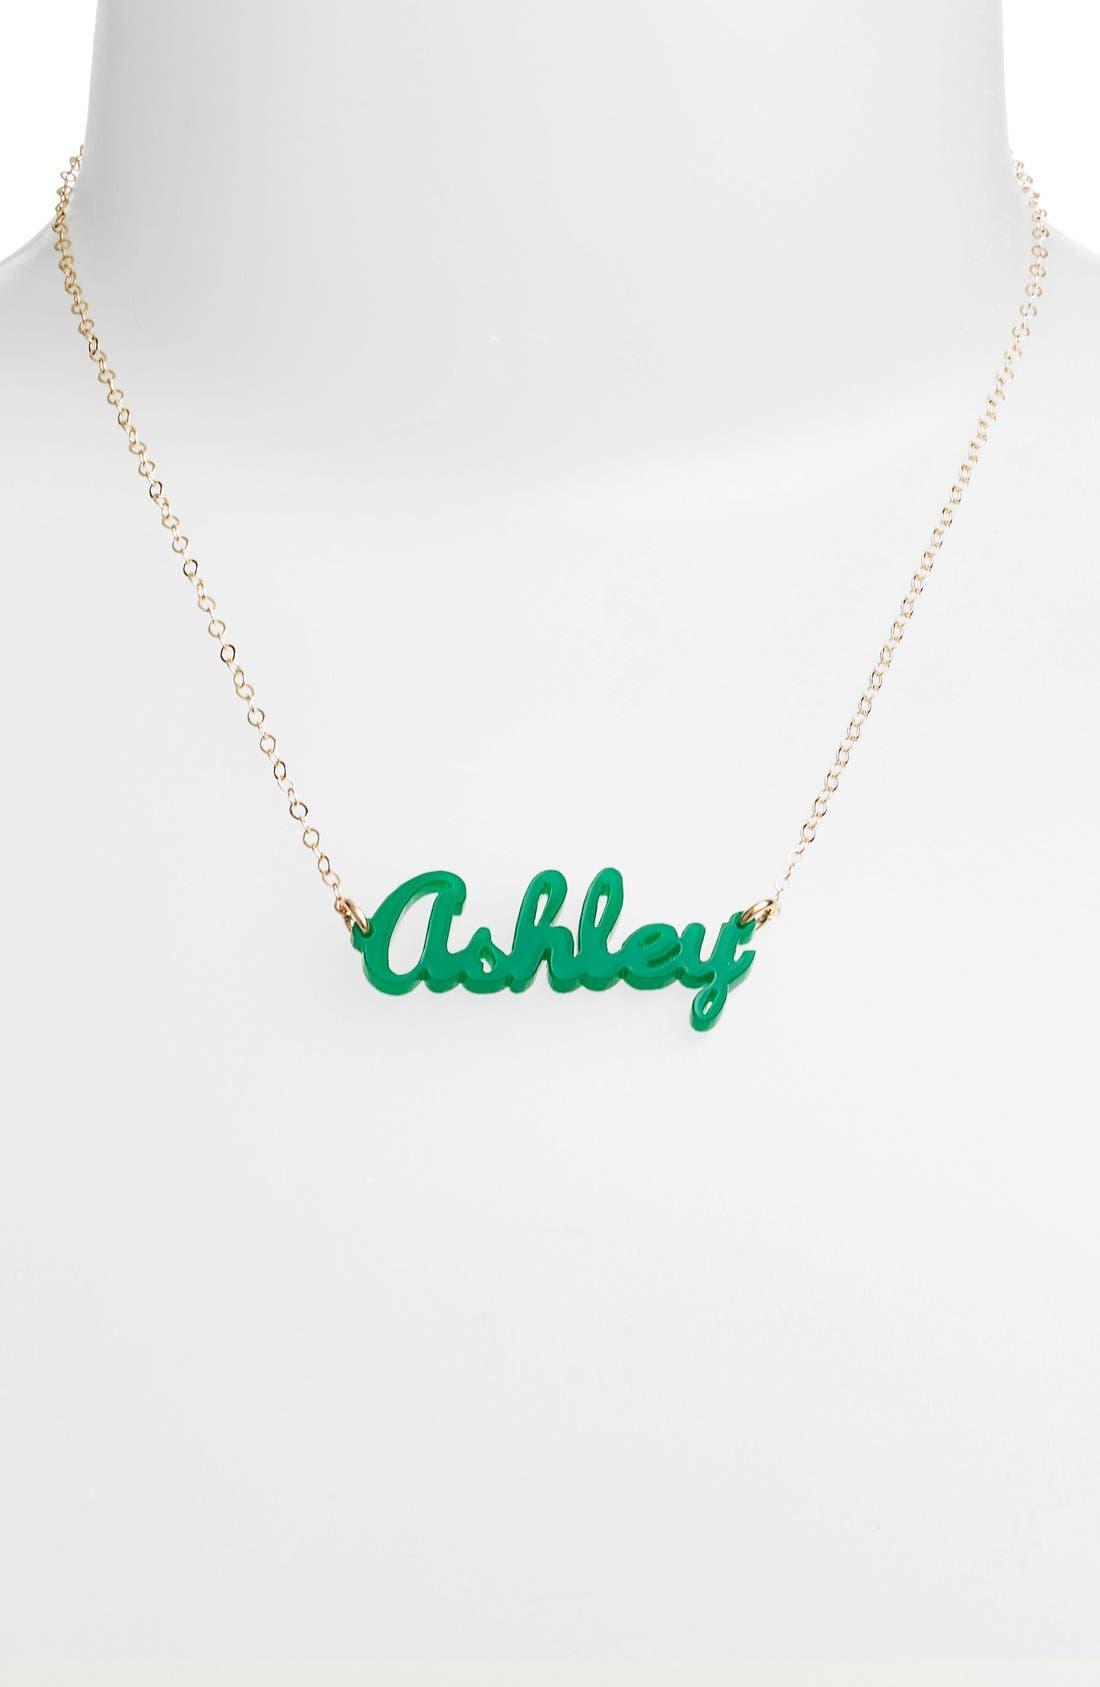 'Script Font' Personalized Nameplate Pendant Necklace,                             Alternate thumbnail 2, color,                             EMERALD/ GOLD